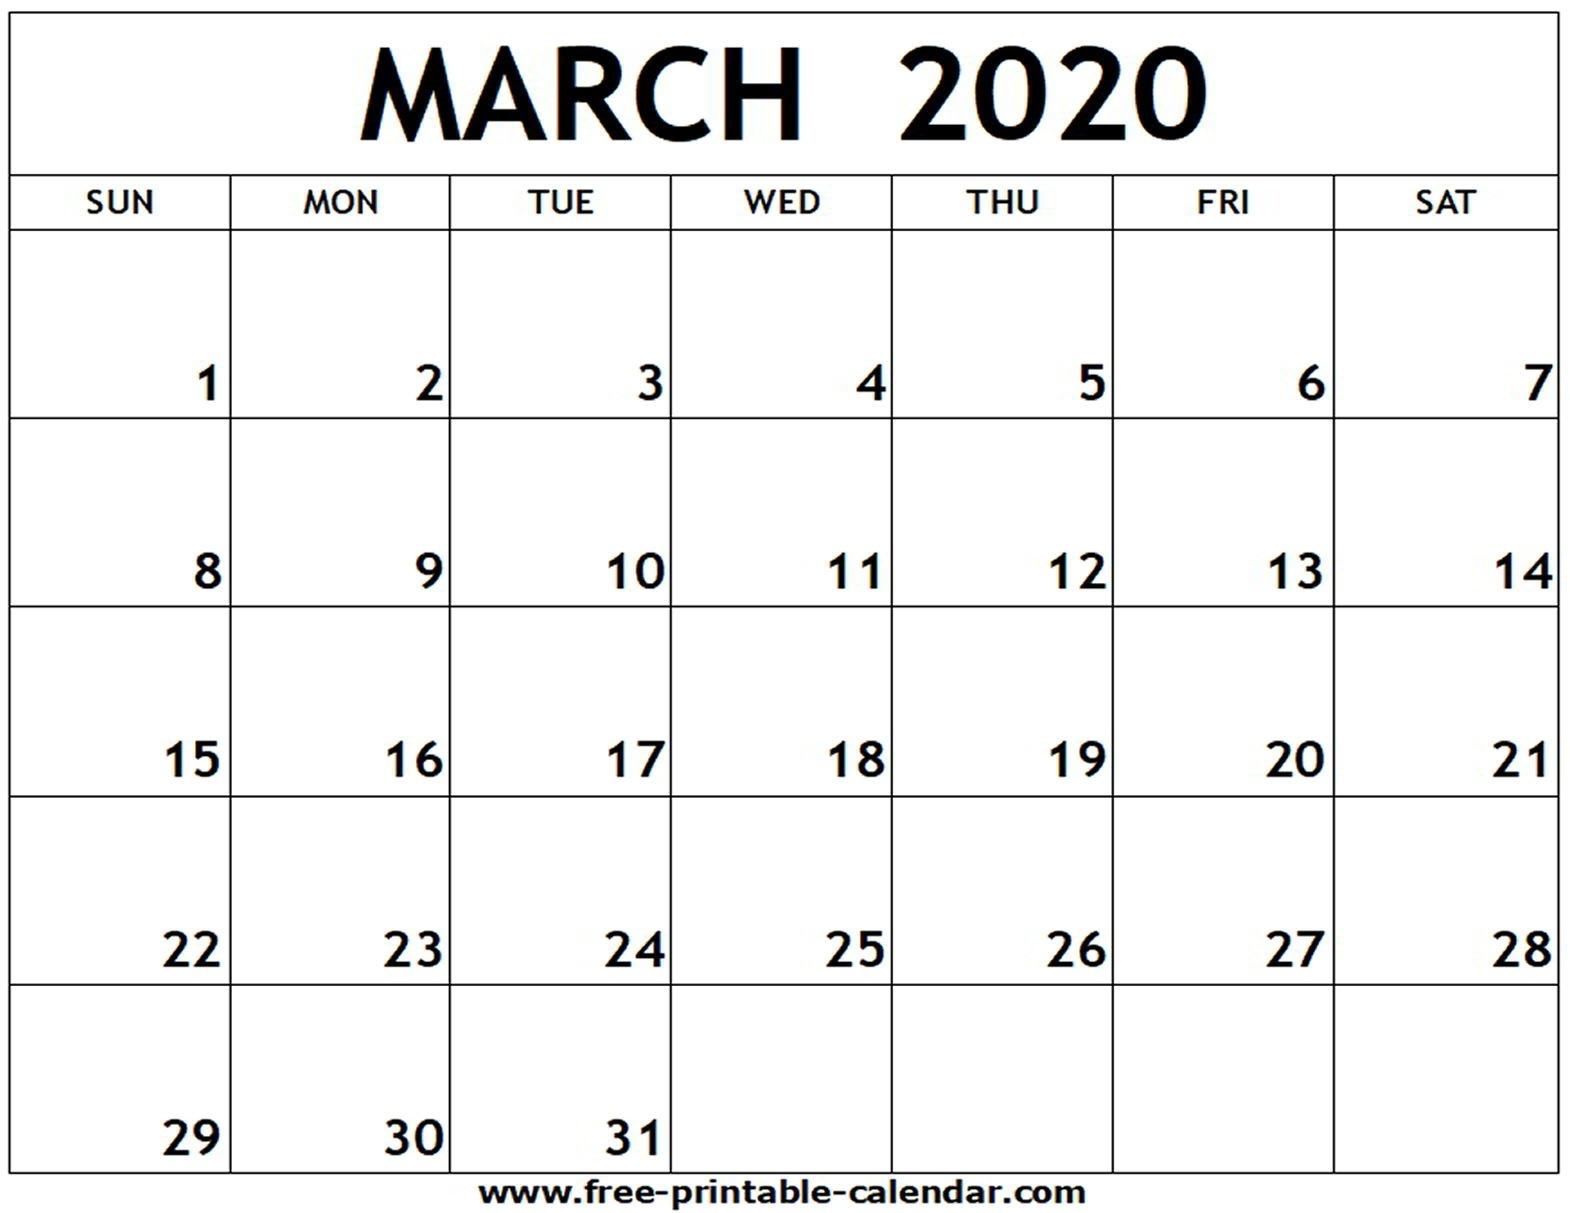 March 2020 Printable Calendar - Free-Printable-Calendar  Printable March 2020 Calendar Pdf